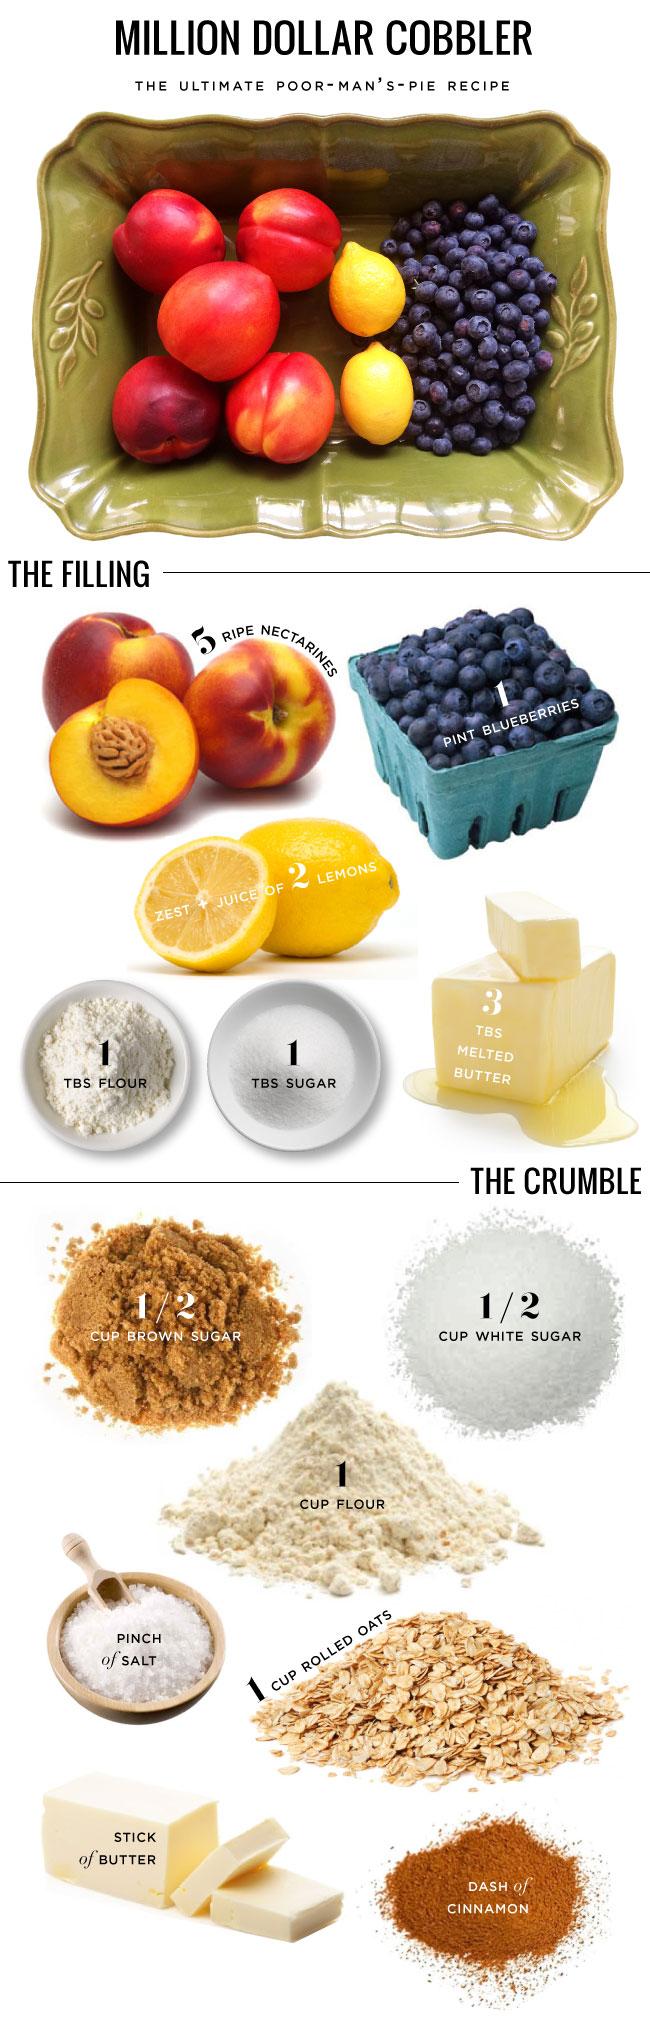 Cobbler-Recipe.jpg